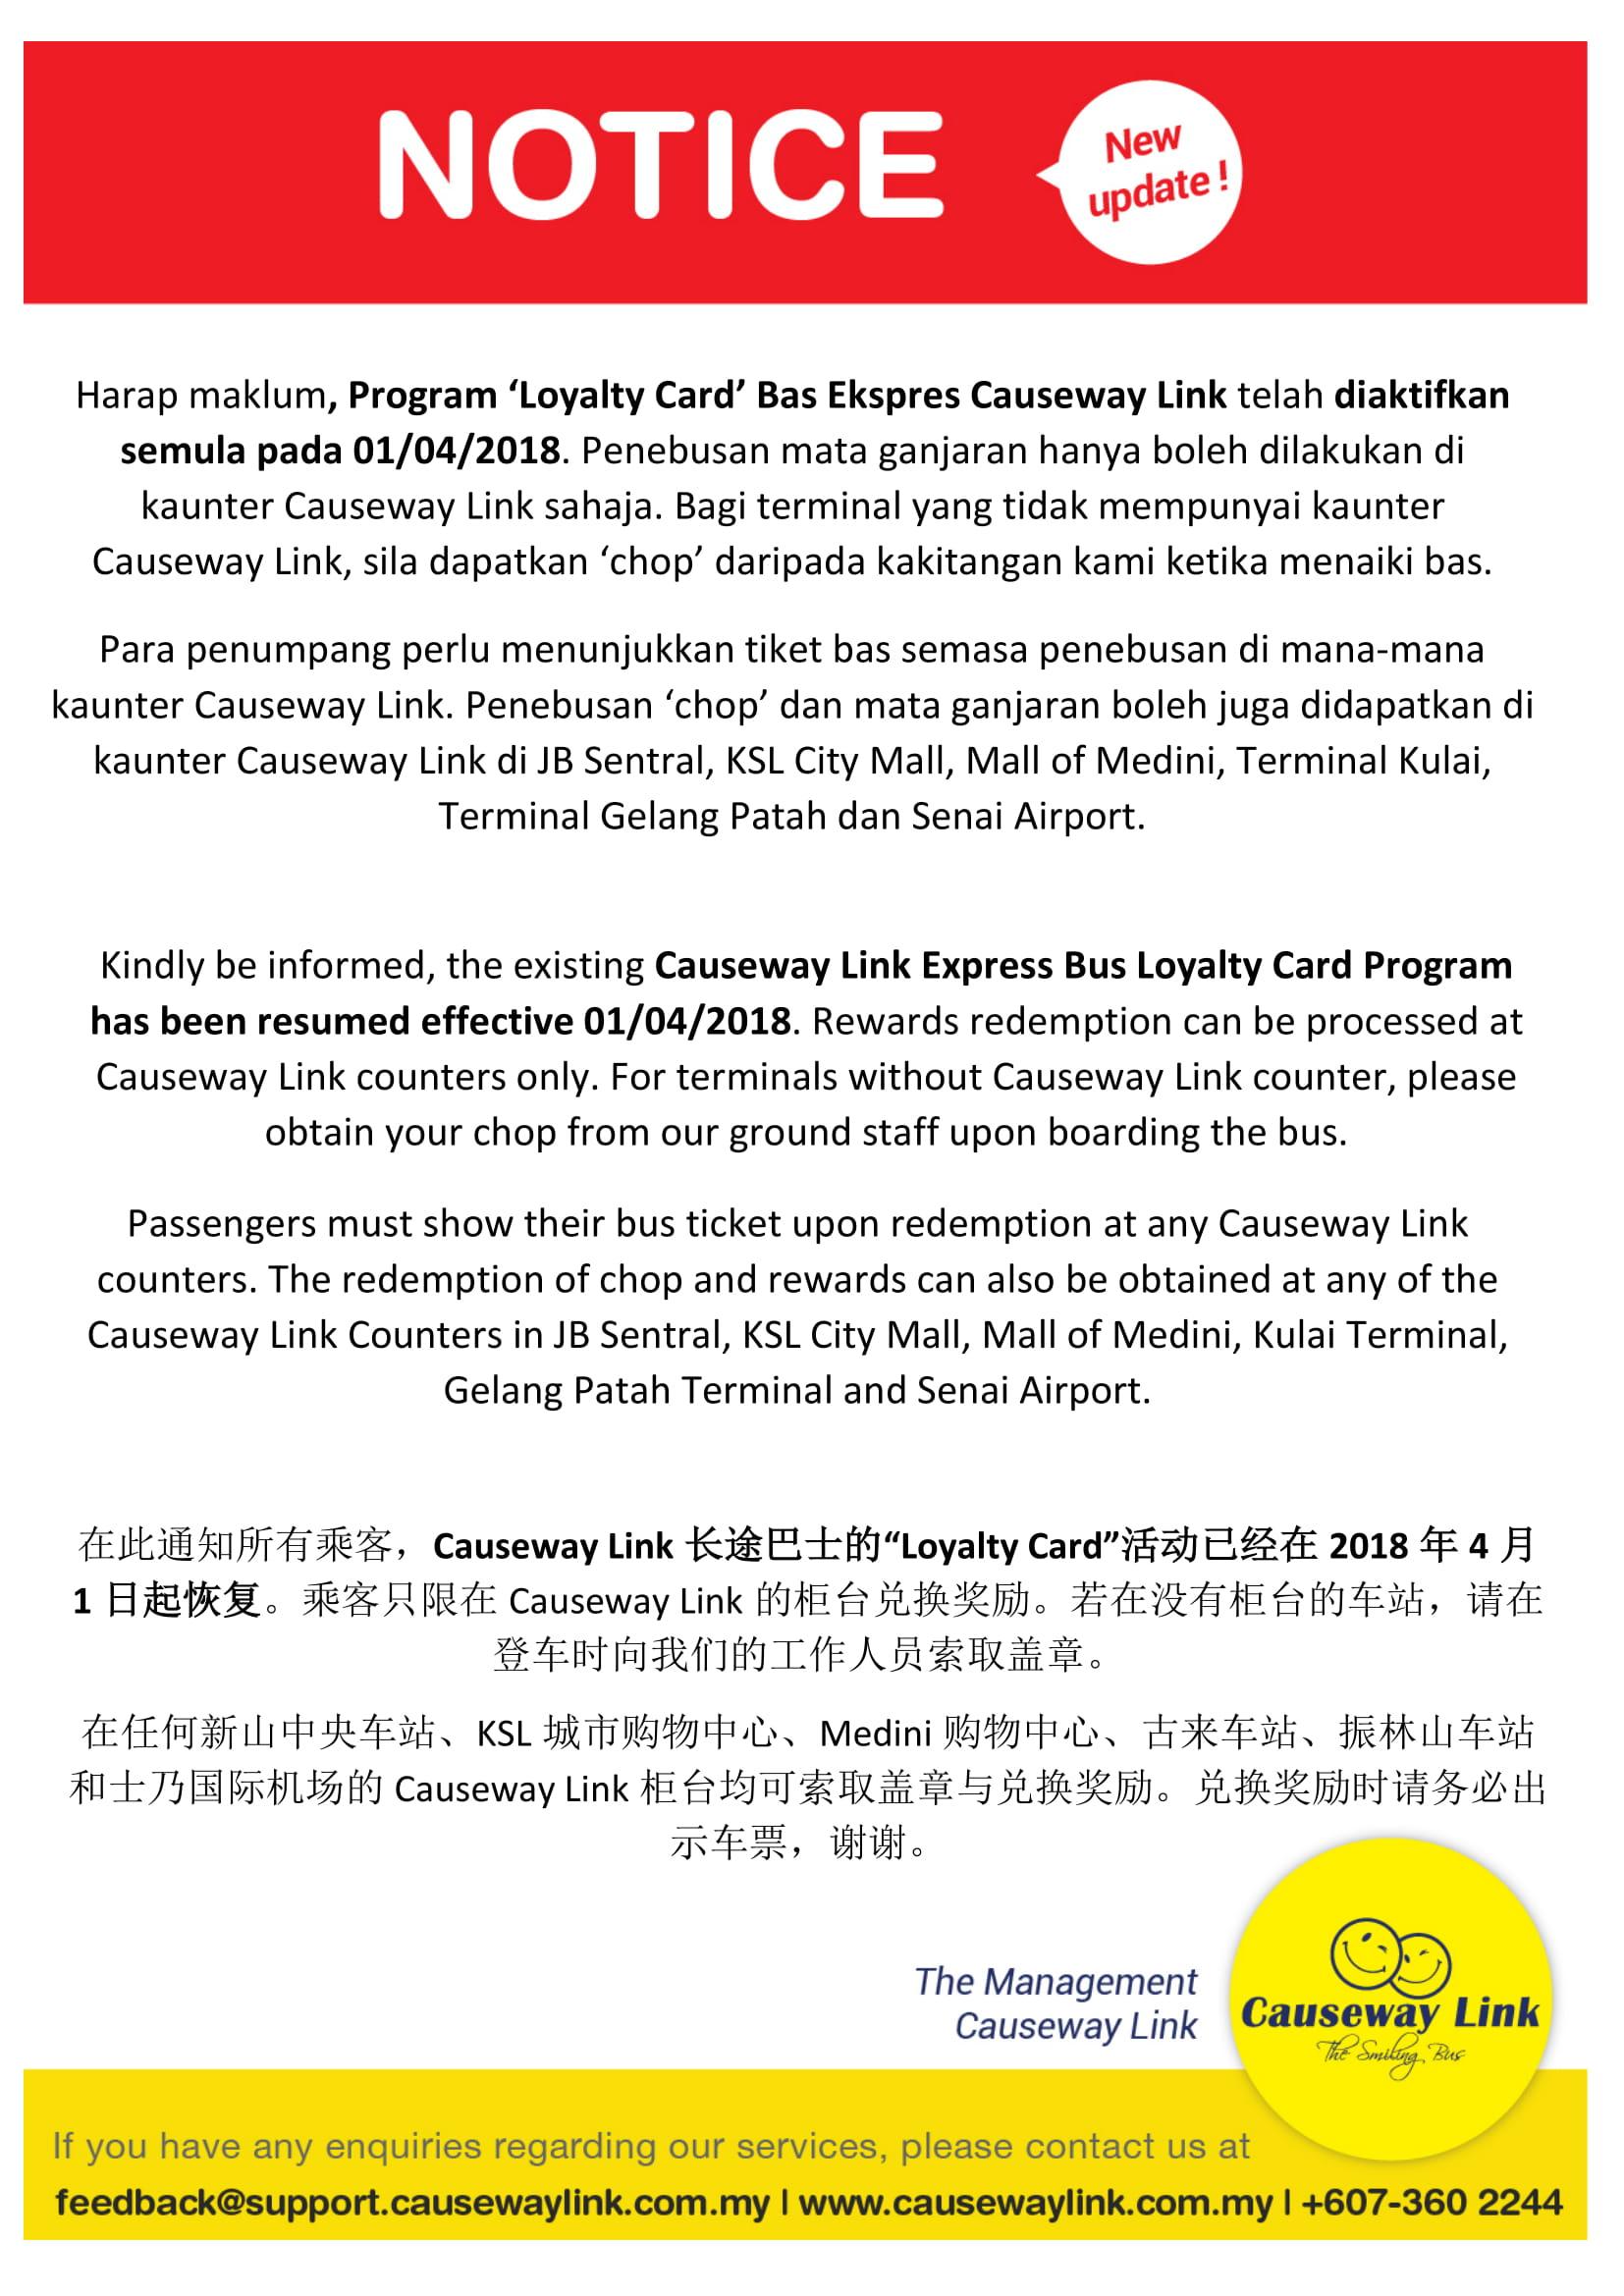 Malaysia Online Express Bus Ticketing In Johor Bahru And Singapore Tiket Gelang 04 Apr 2018